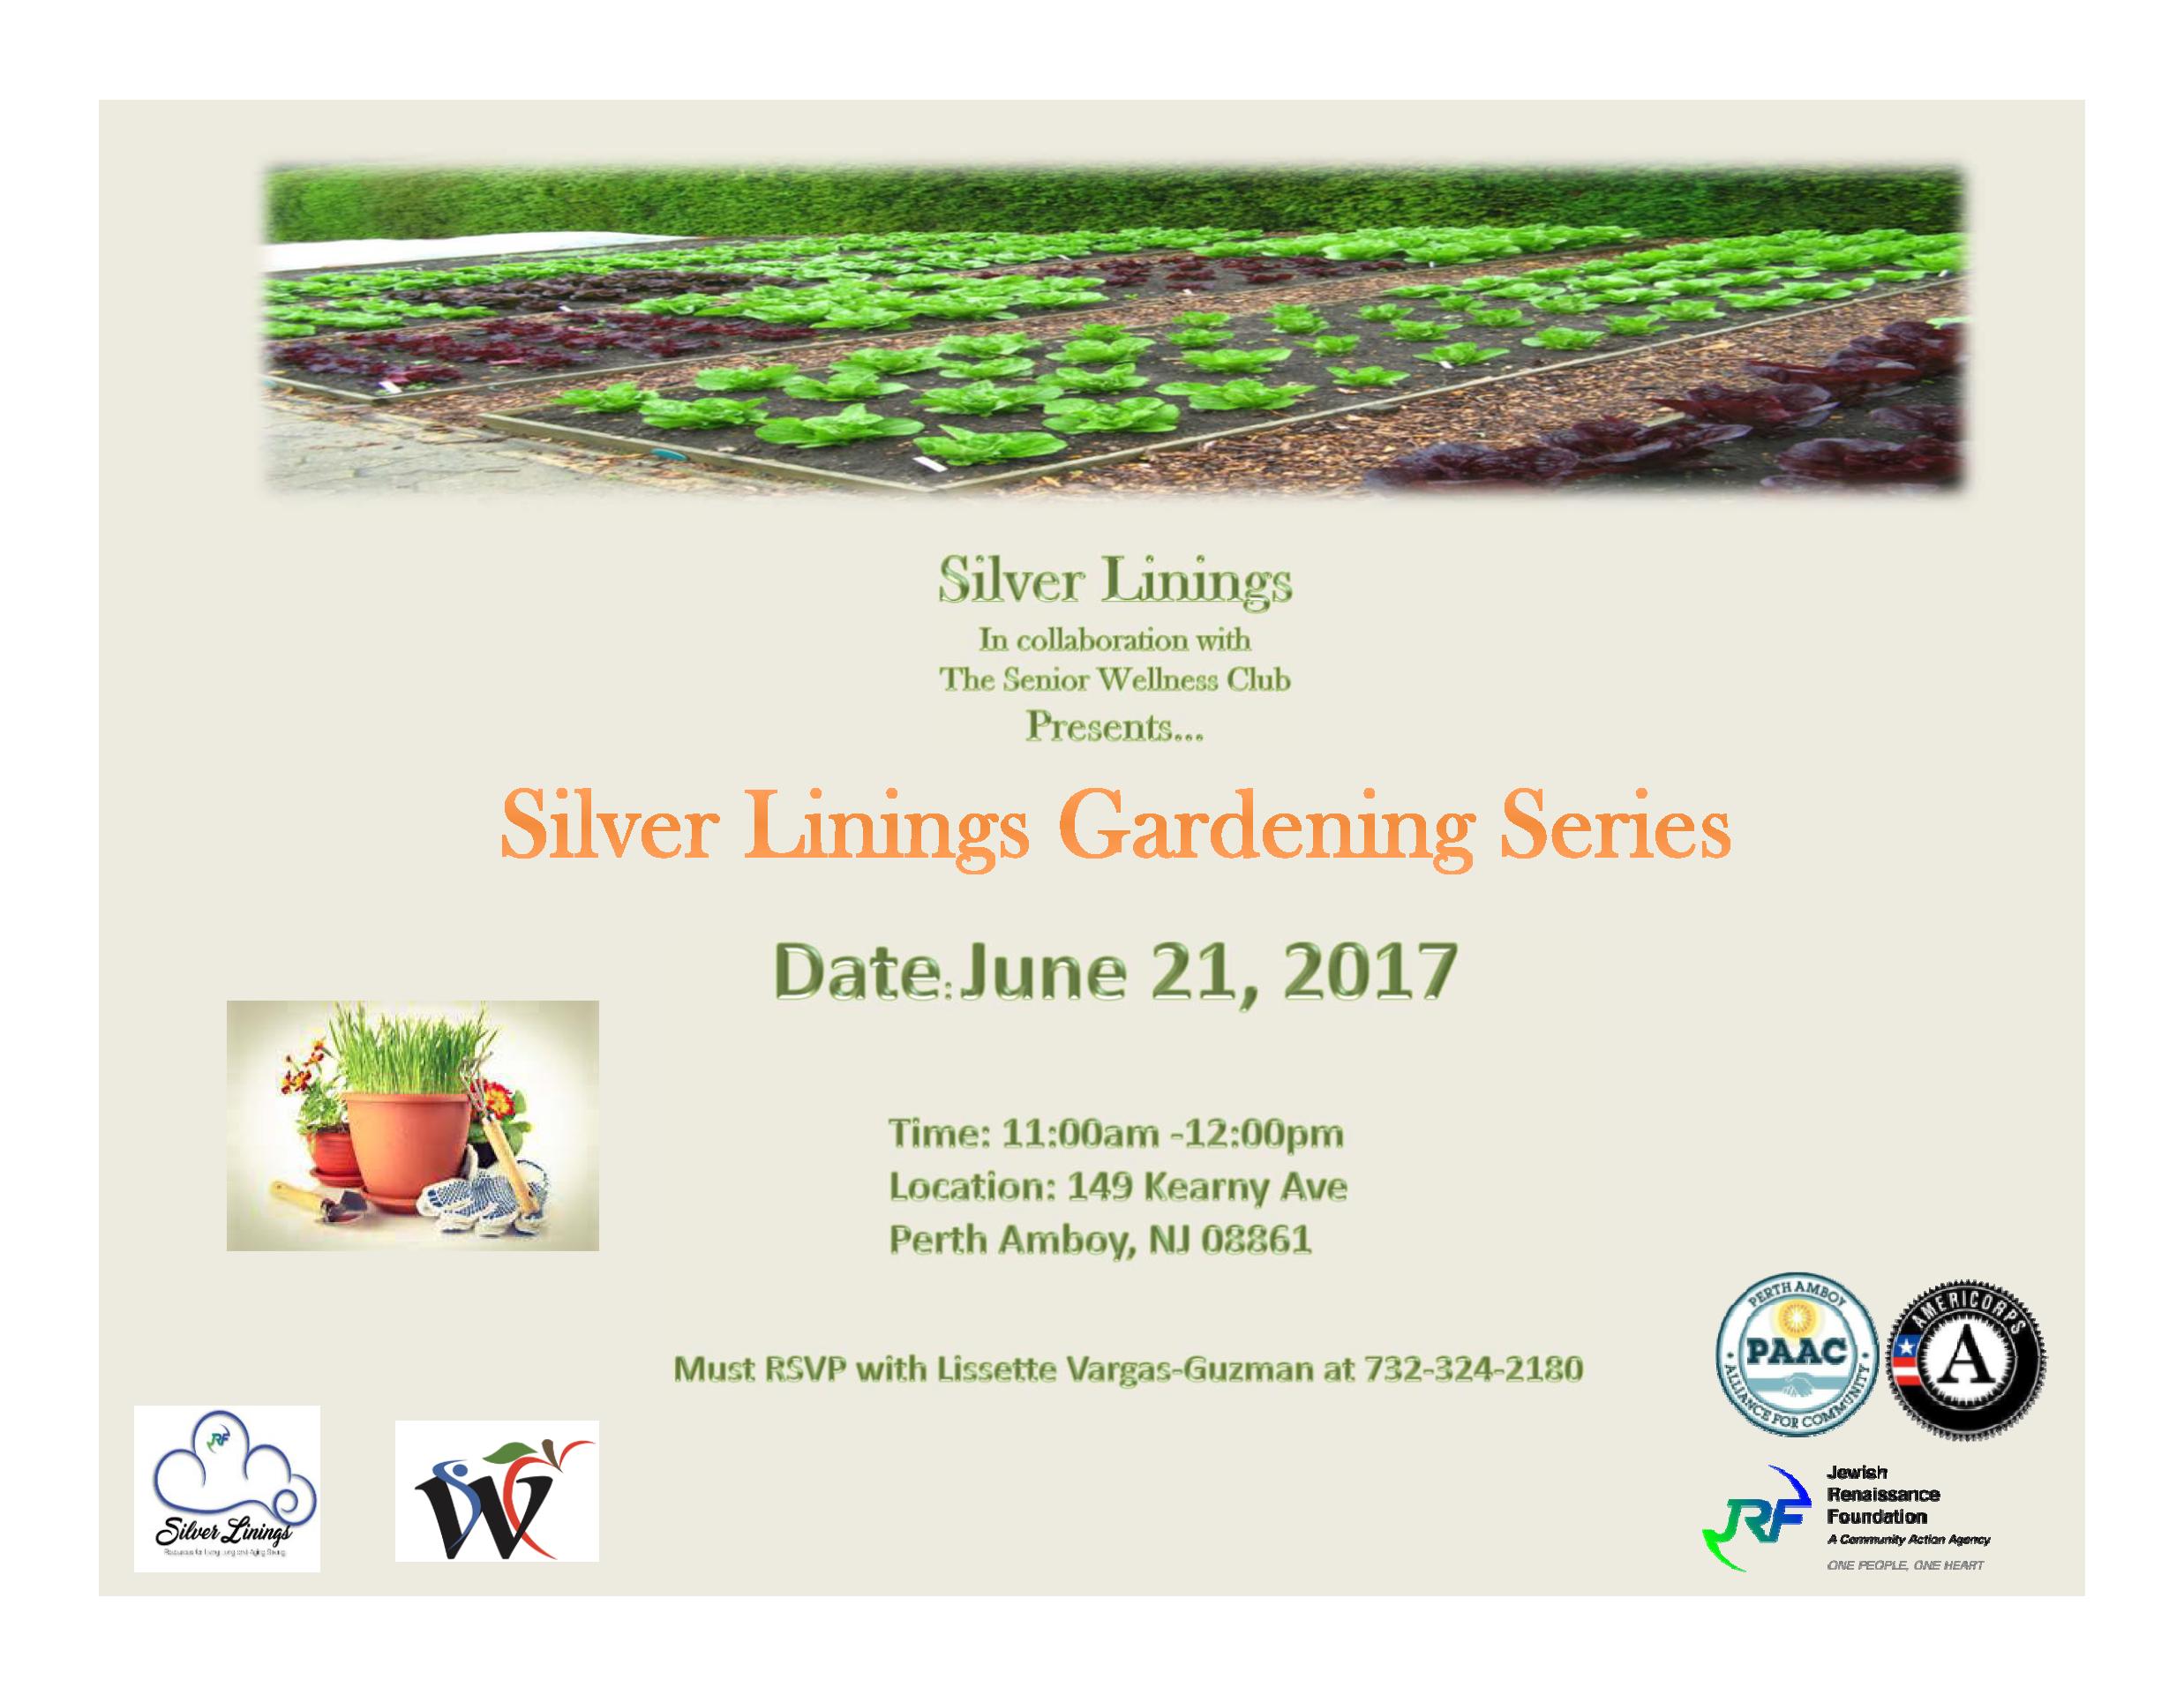 Silver Linings Gardening Series